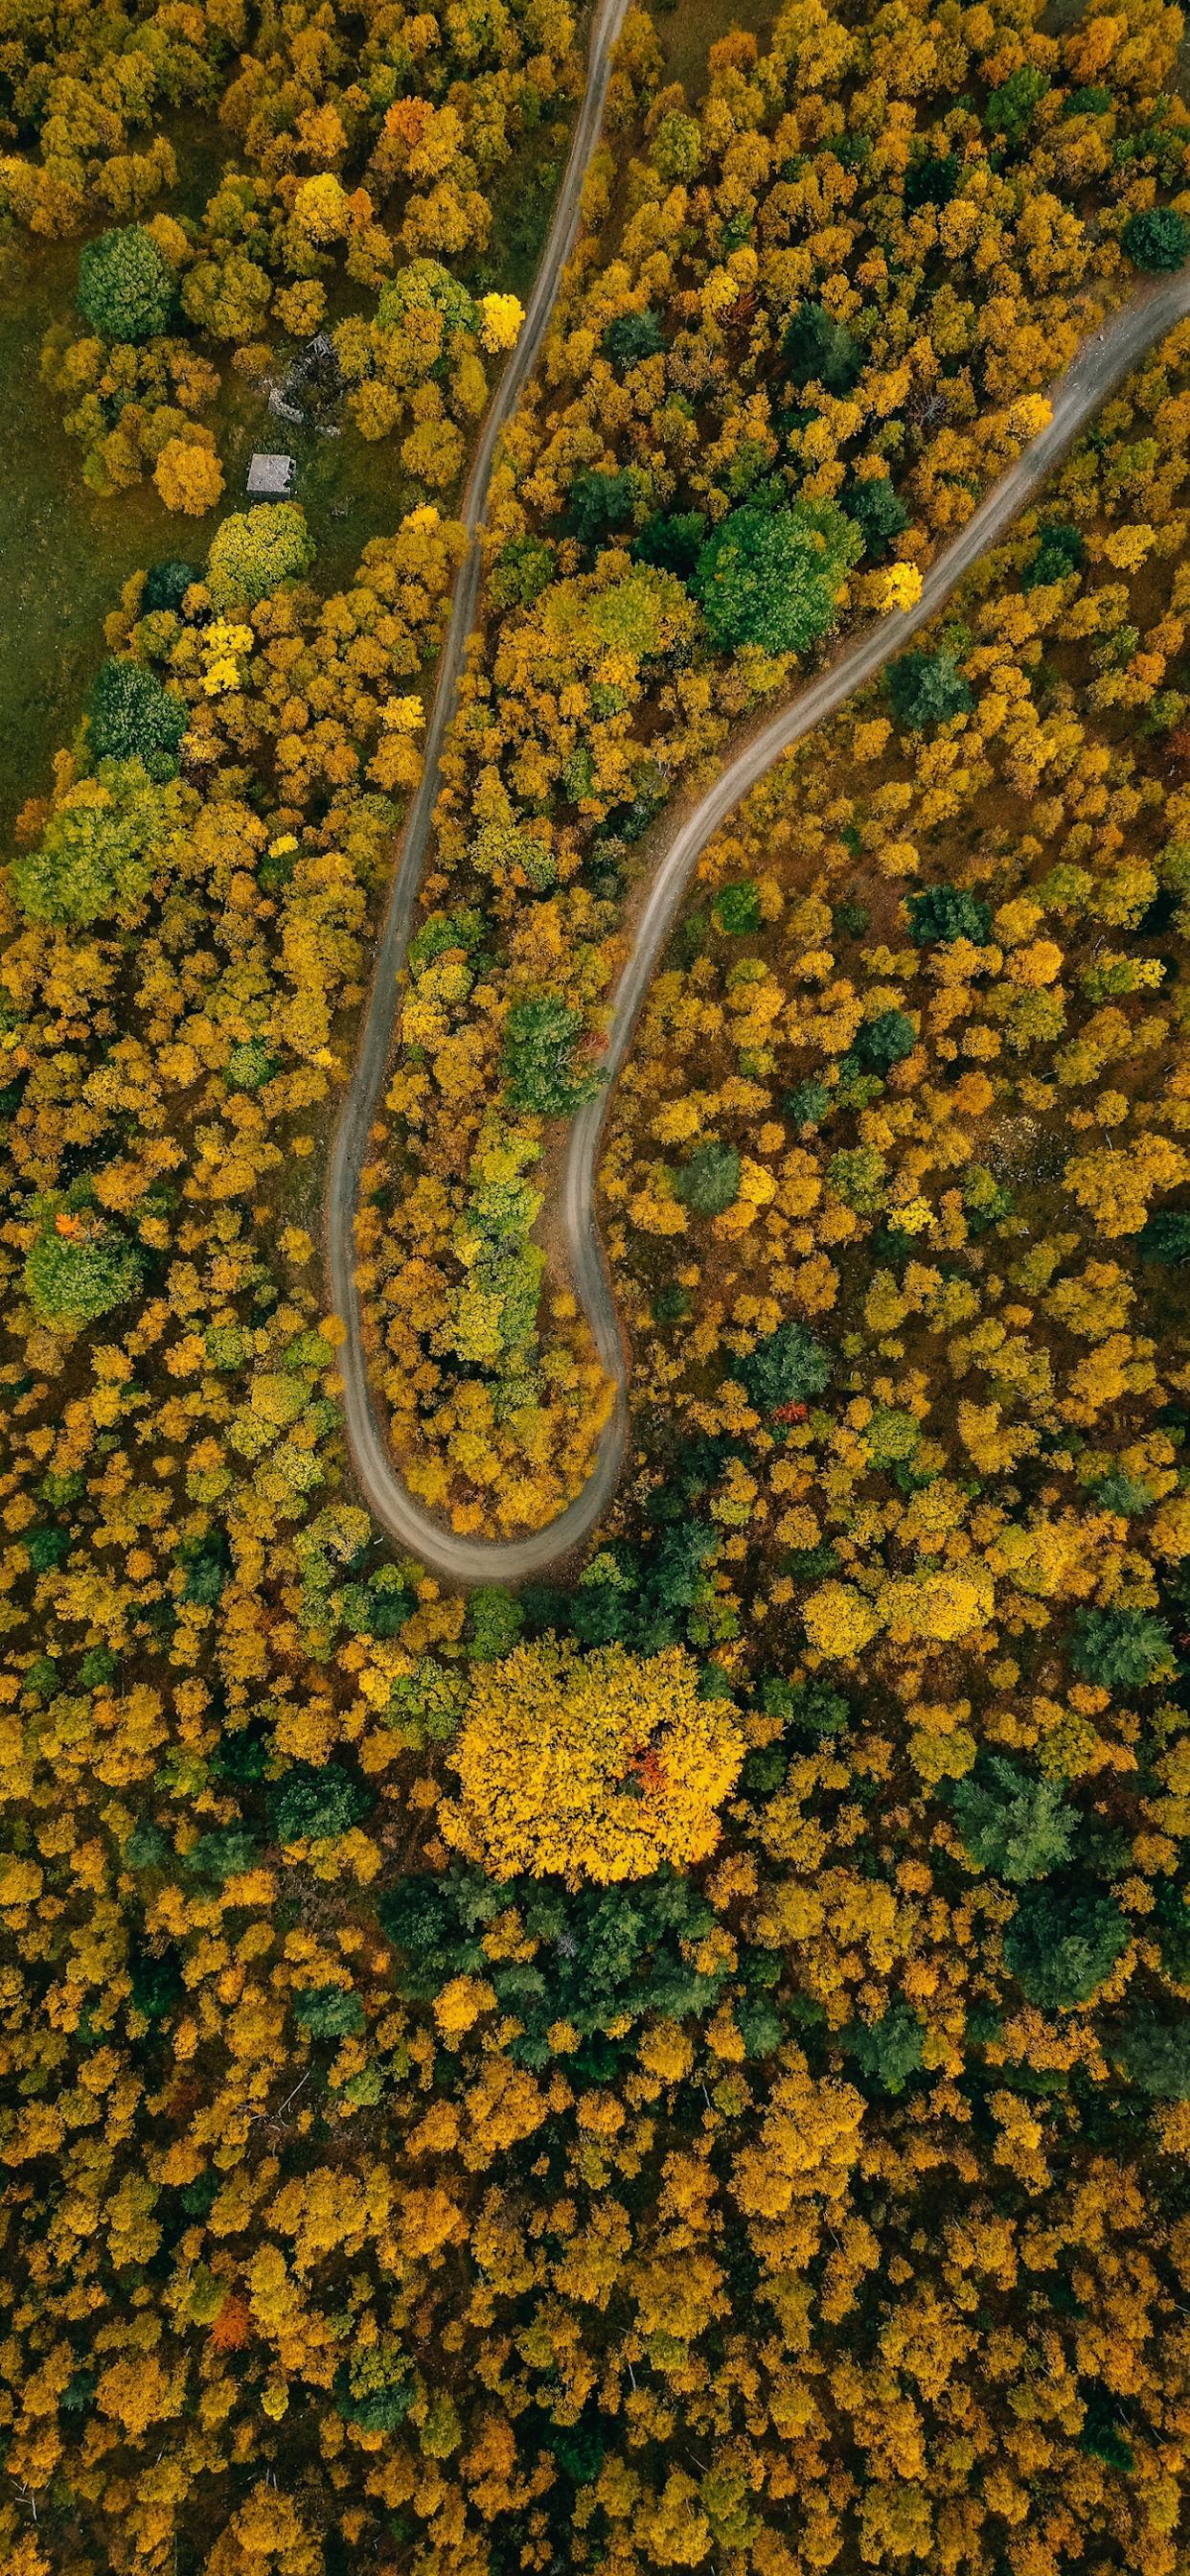 iPhone wallpapers aerial image llavorsi spain Fonds d'écran iPhone du 07/02/2020